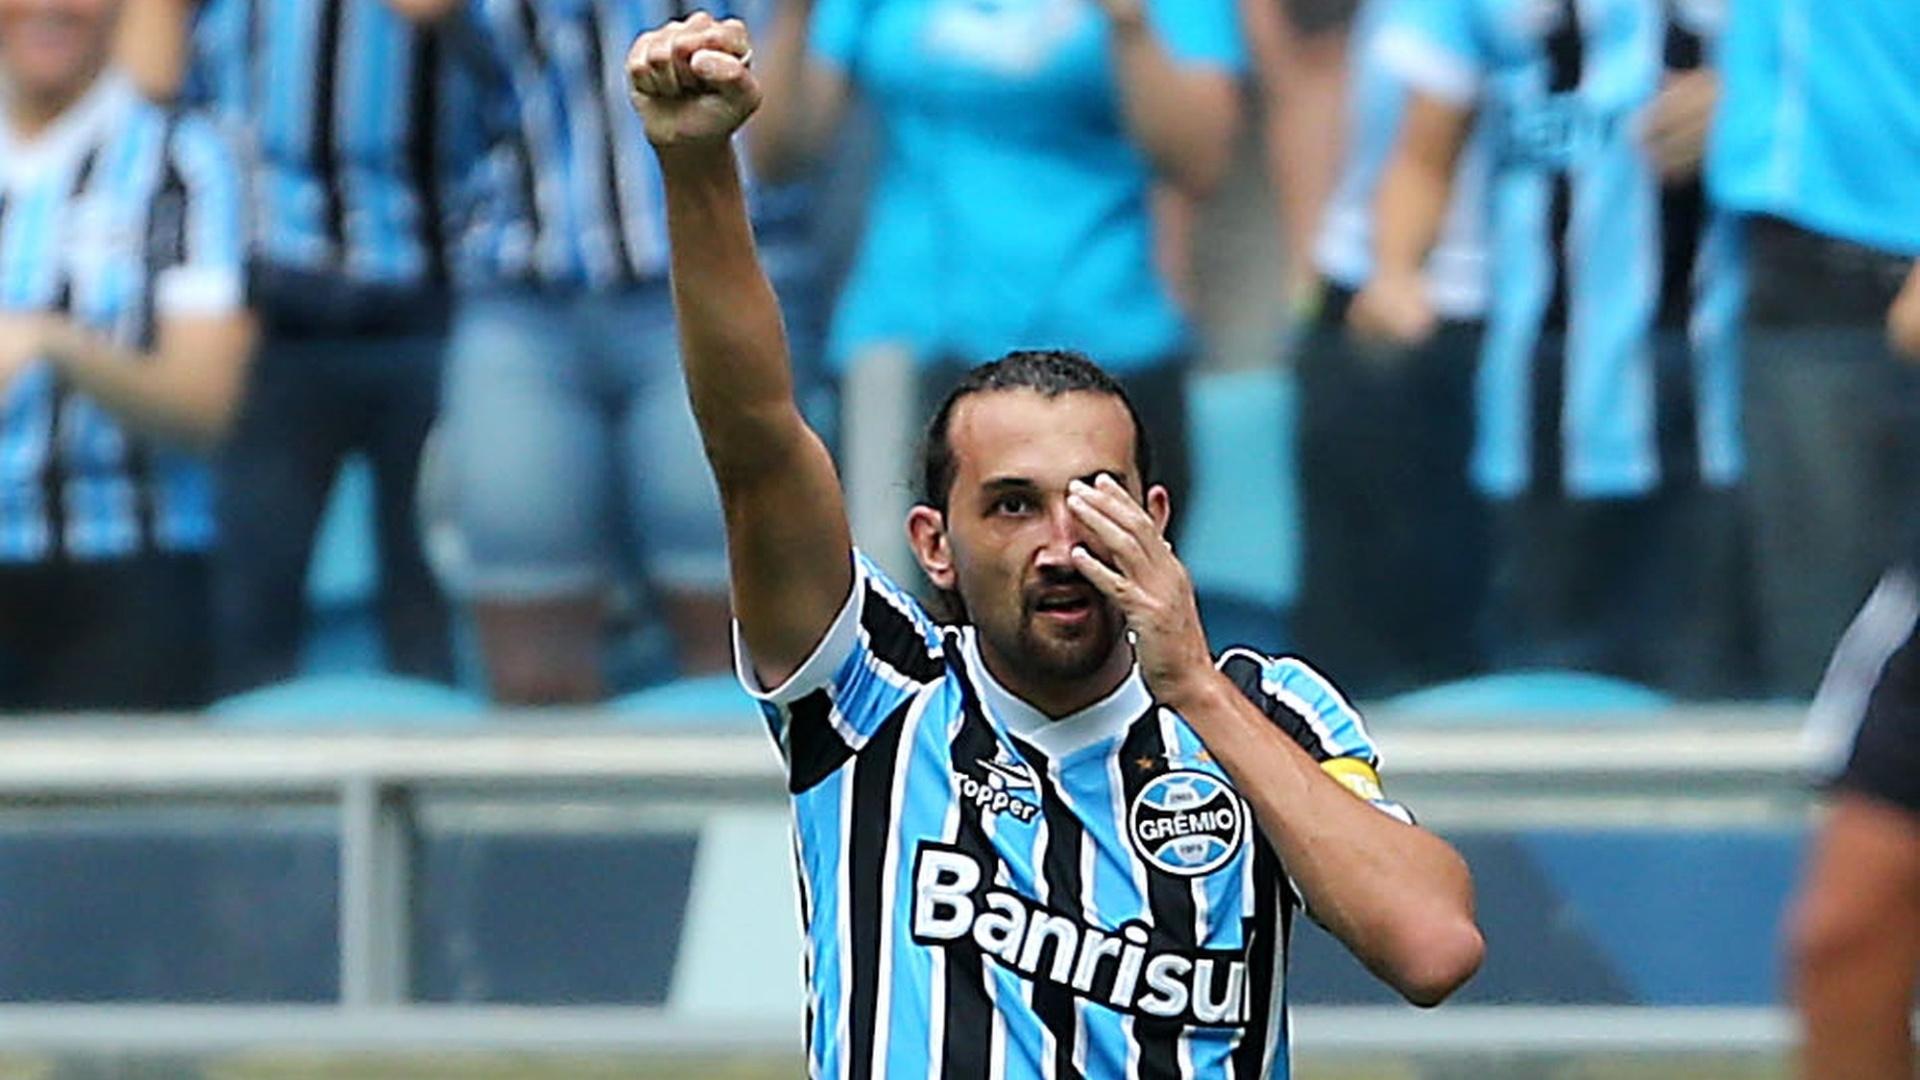 30.mar.2014 - Barcos comemora depois de marcar para o Grêmio na primeira partida da final contra o Internacional